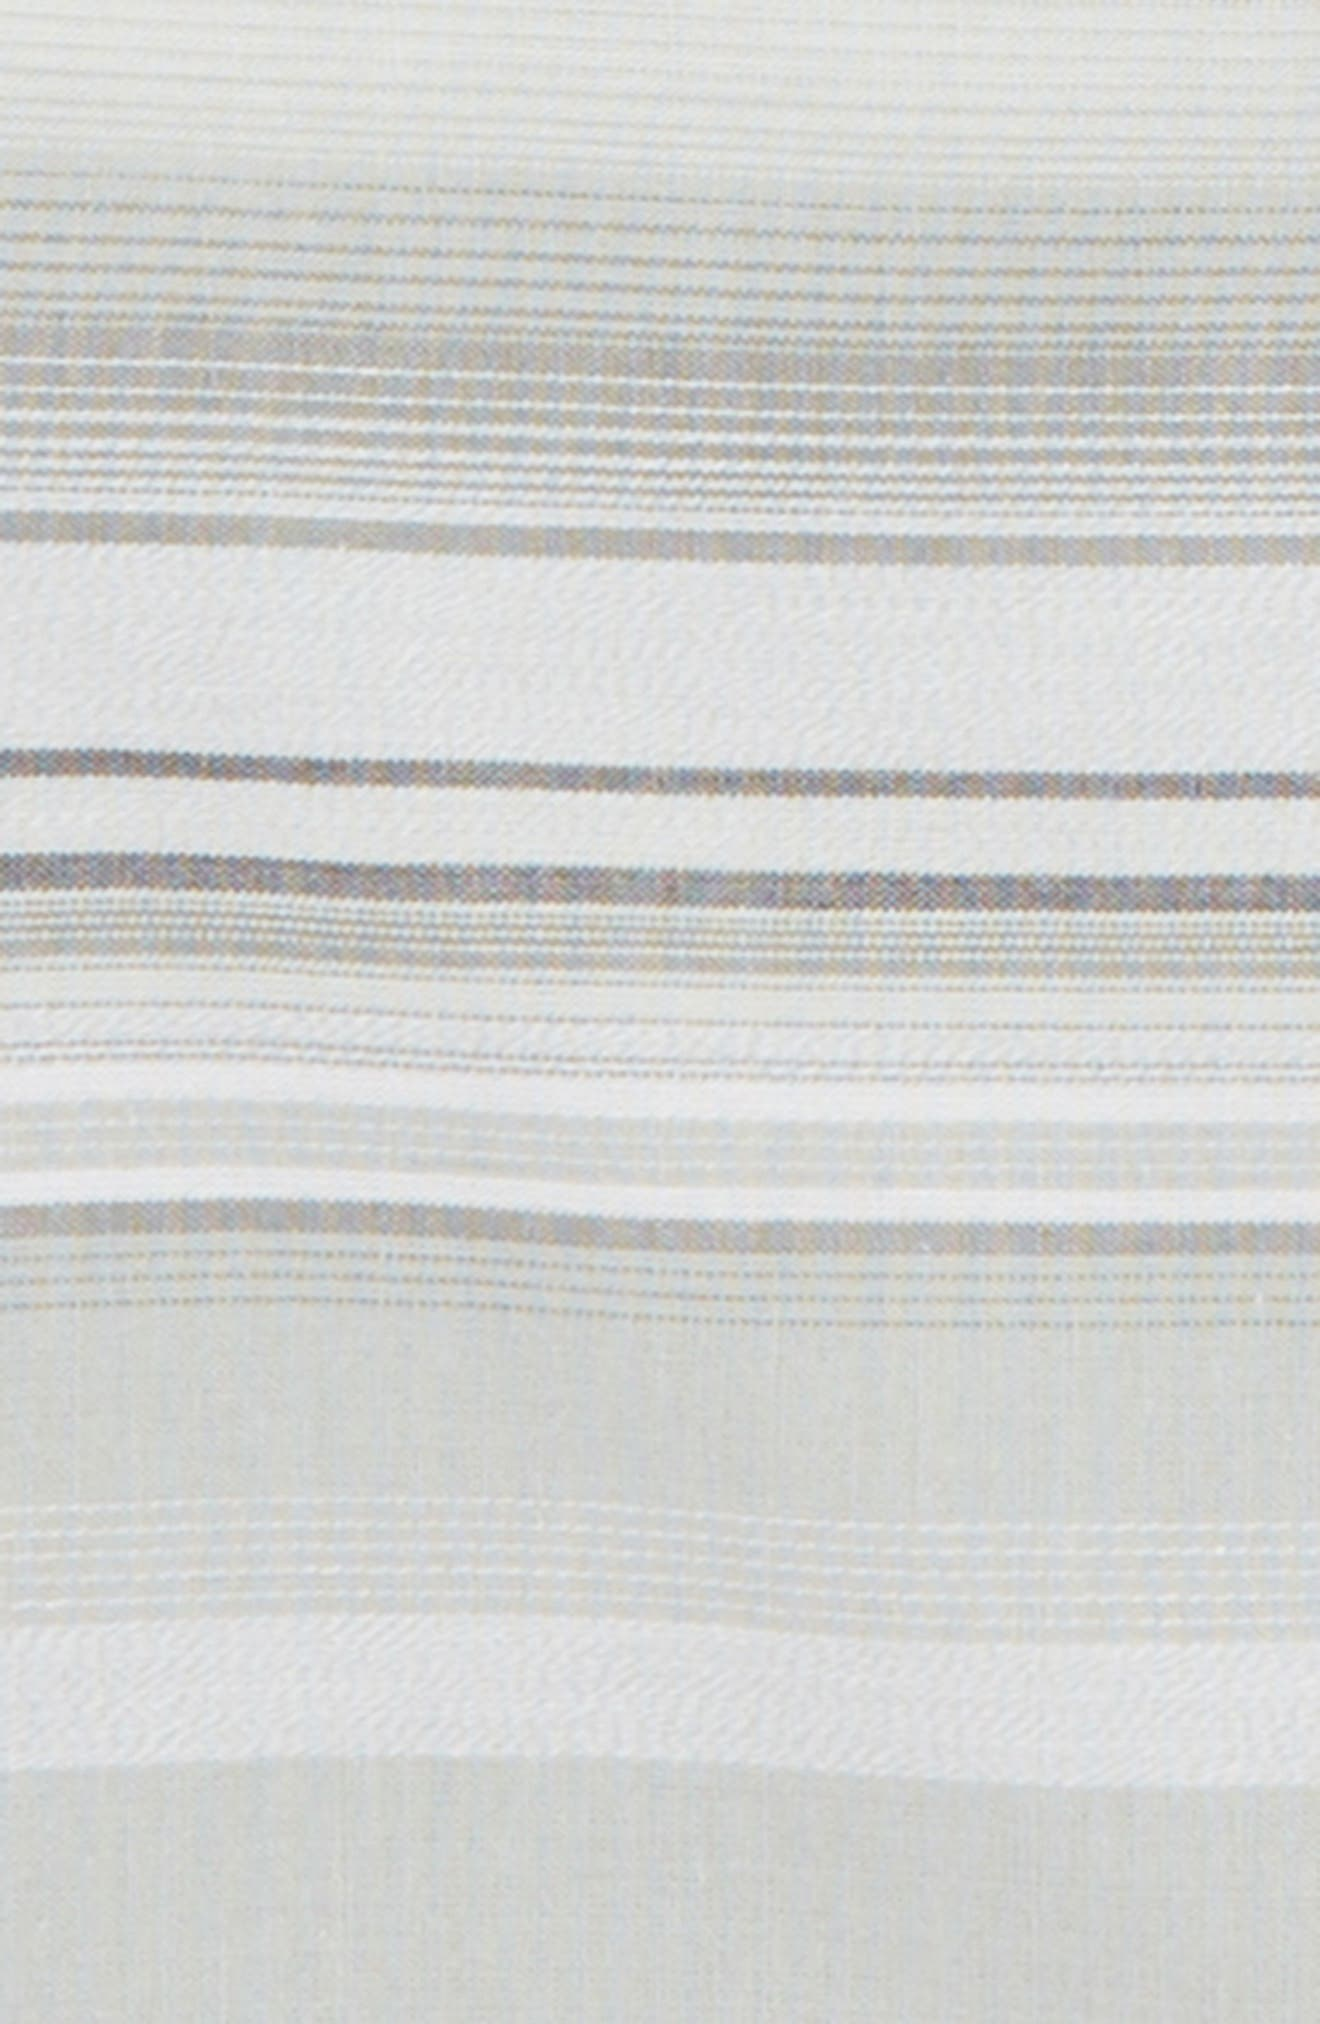 O'NEILL,                             Letting Go Woven Shirt,                             Alternate thumbnail 3, color,                             LIGHT GREY